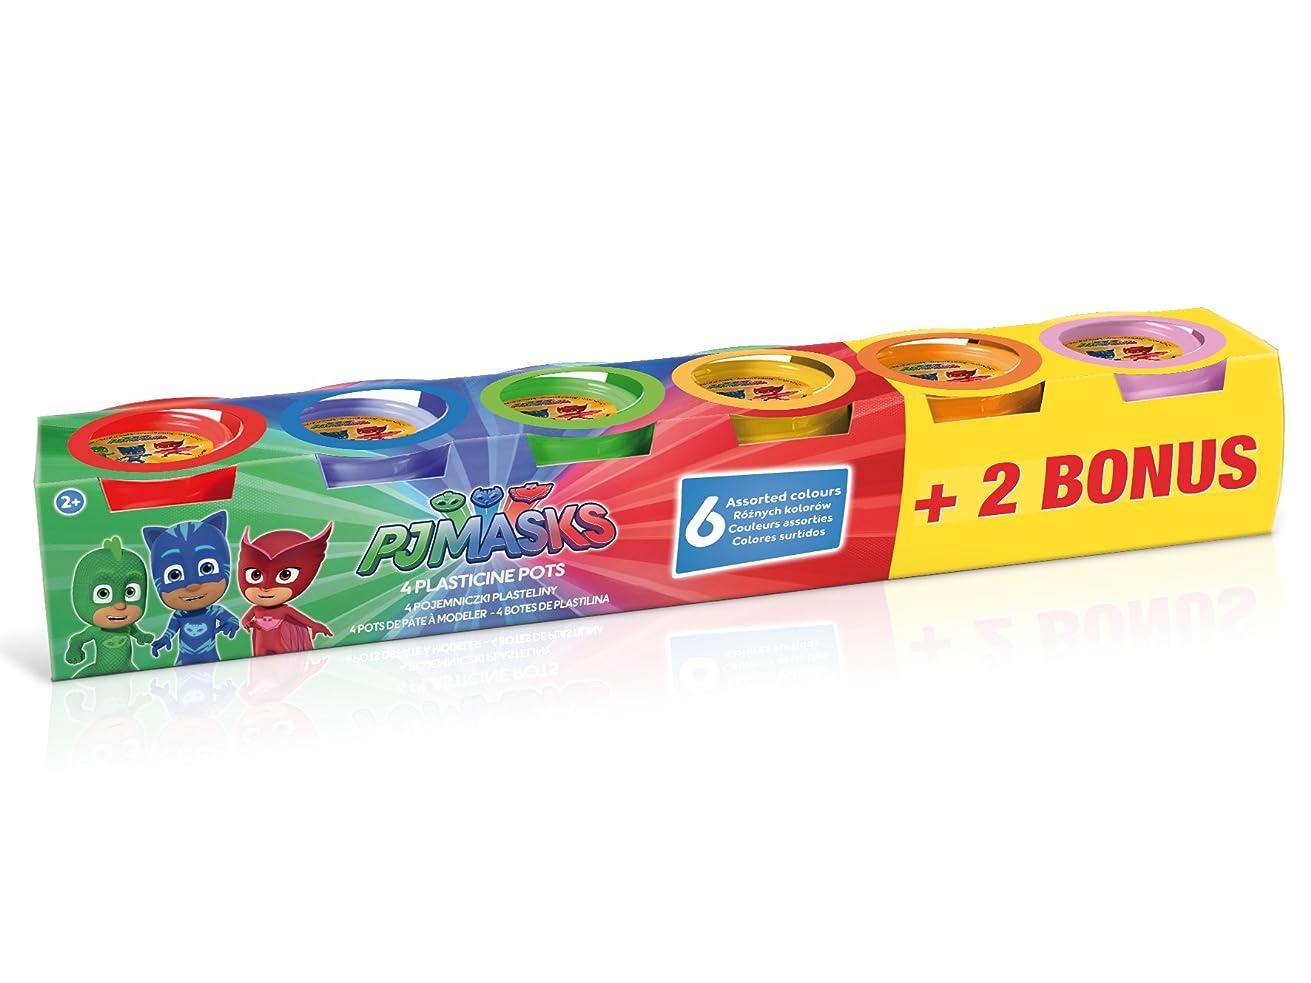 CANAL TOYS PJ Masks 4 Pots of Modelling Clay + 2 Bonus, PJC 004